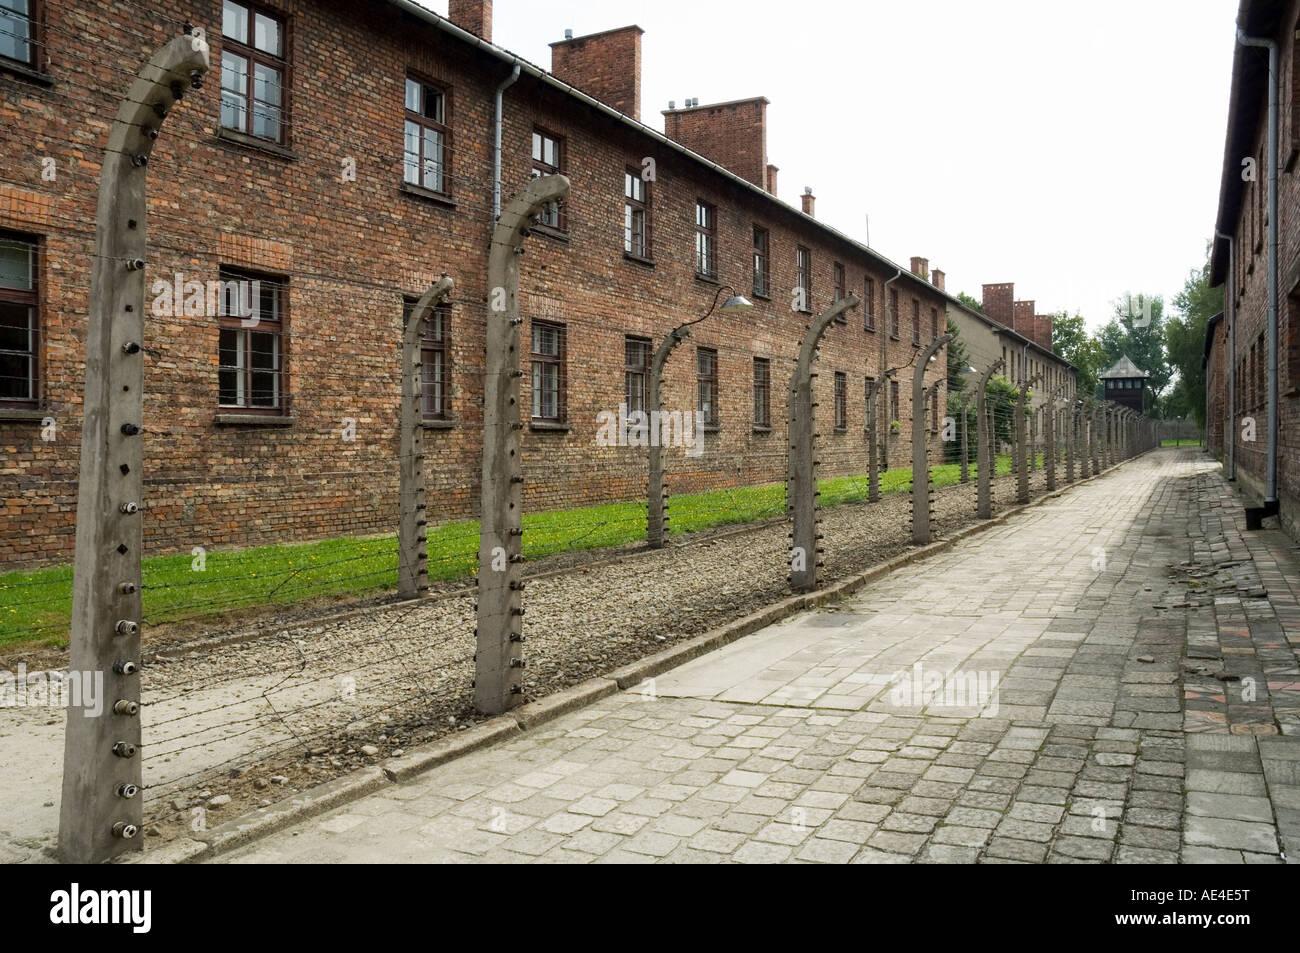 Theresienstadt family camp (Auschwitz II-Birkenau)